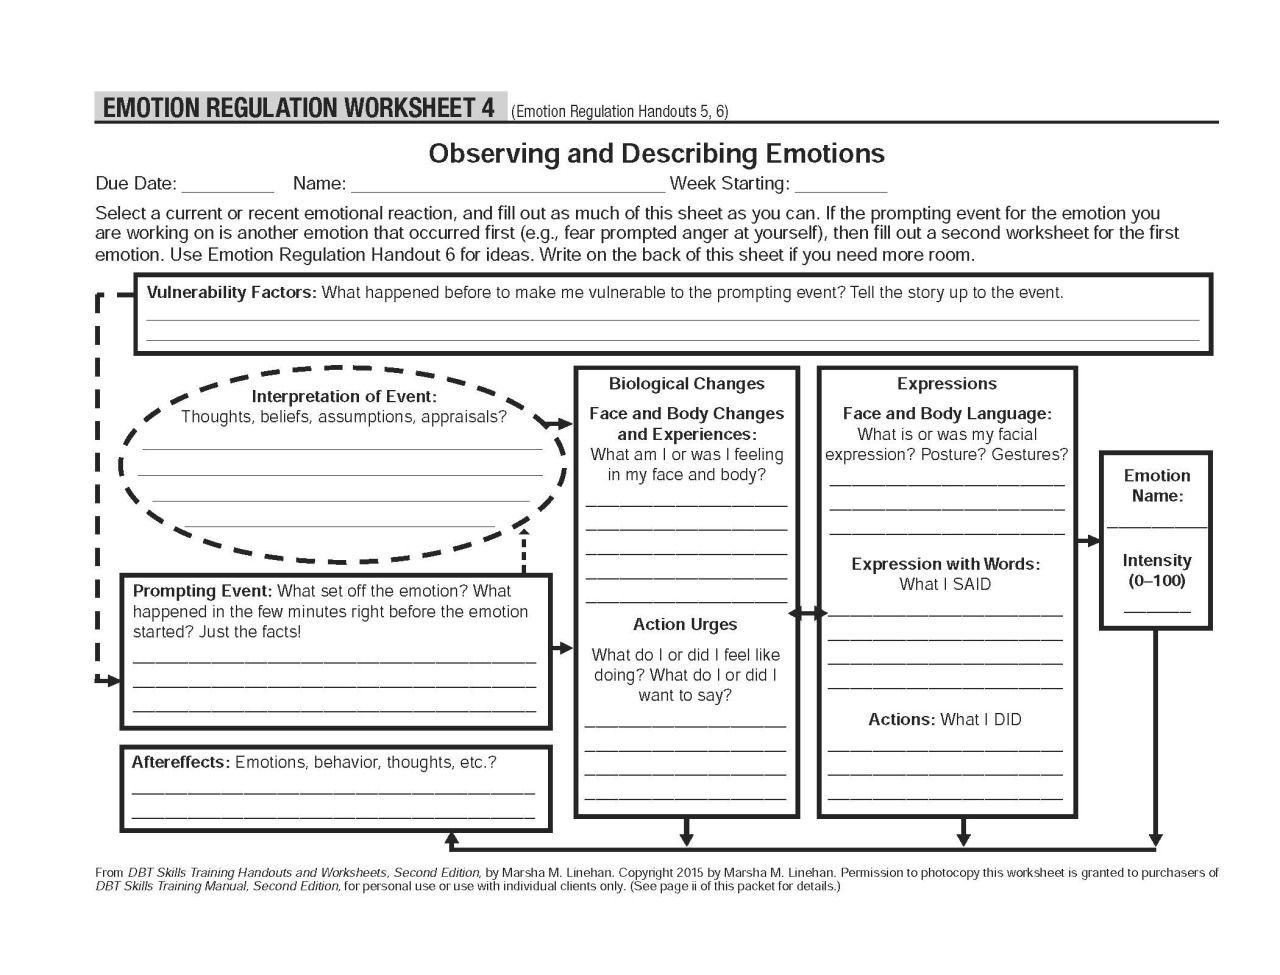 Describing Resources Observing Selfhelp Healing Schemas Dbt Andhealing Schemas Dbt Self Help Resources Obse Dbt Self Help Dbt Therapy Dbt Worksheets